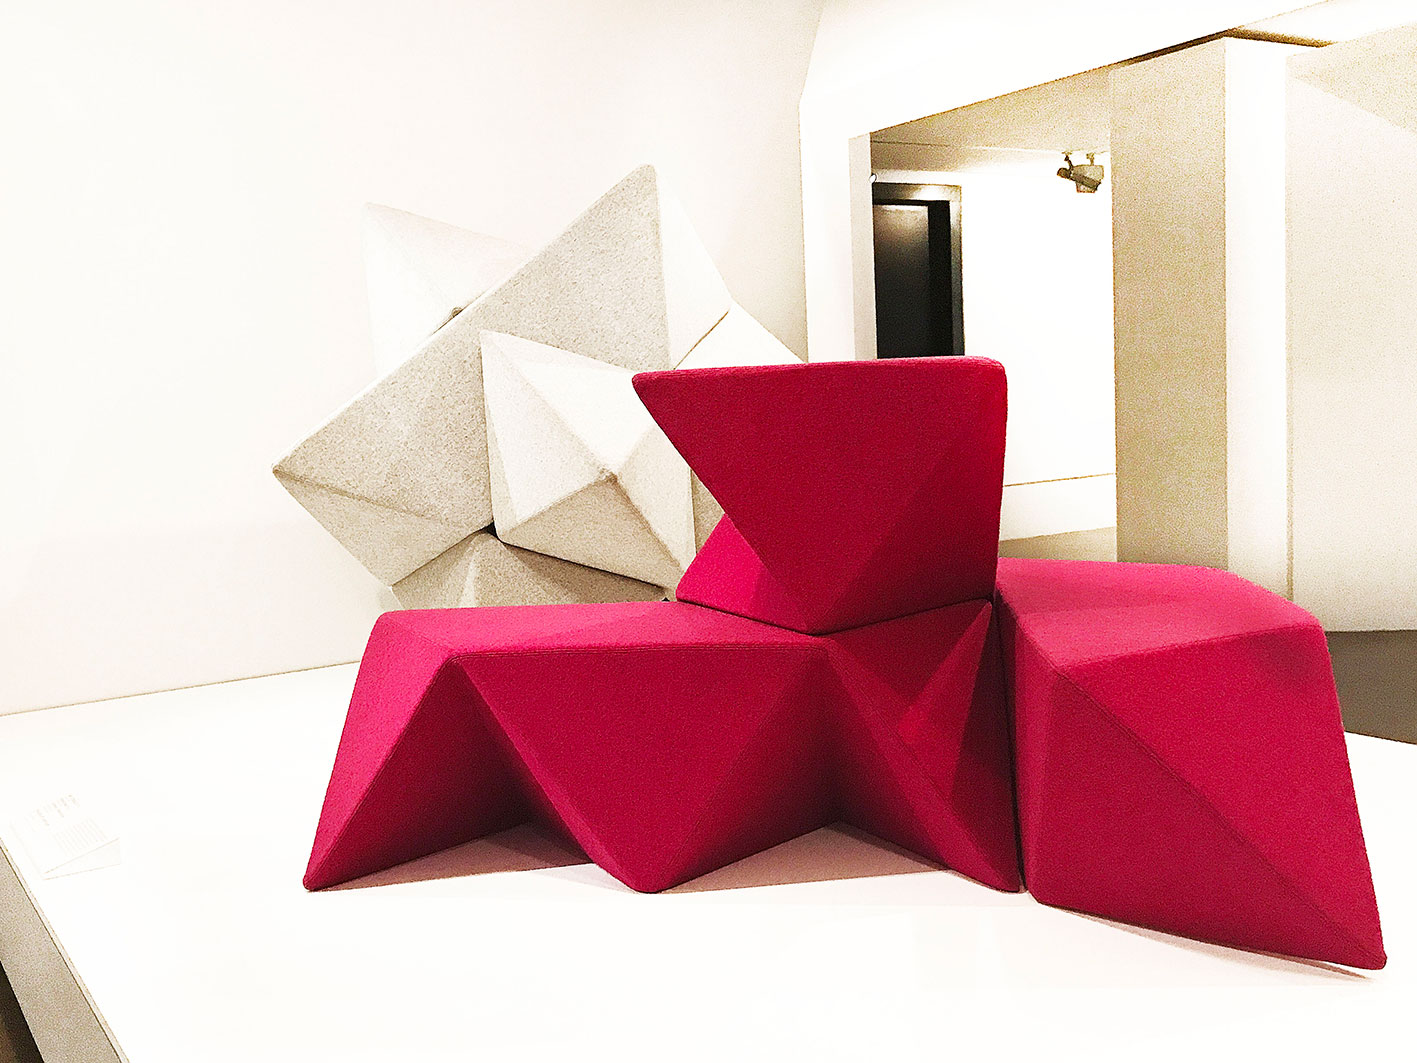 Melbartdiary_Chair-8.jpg